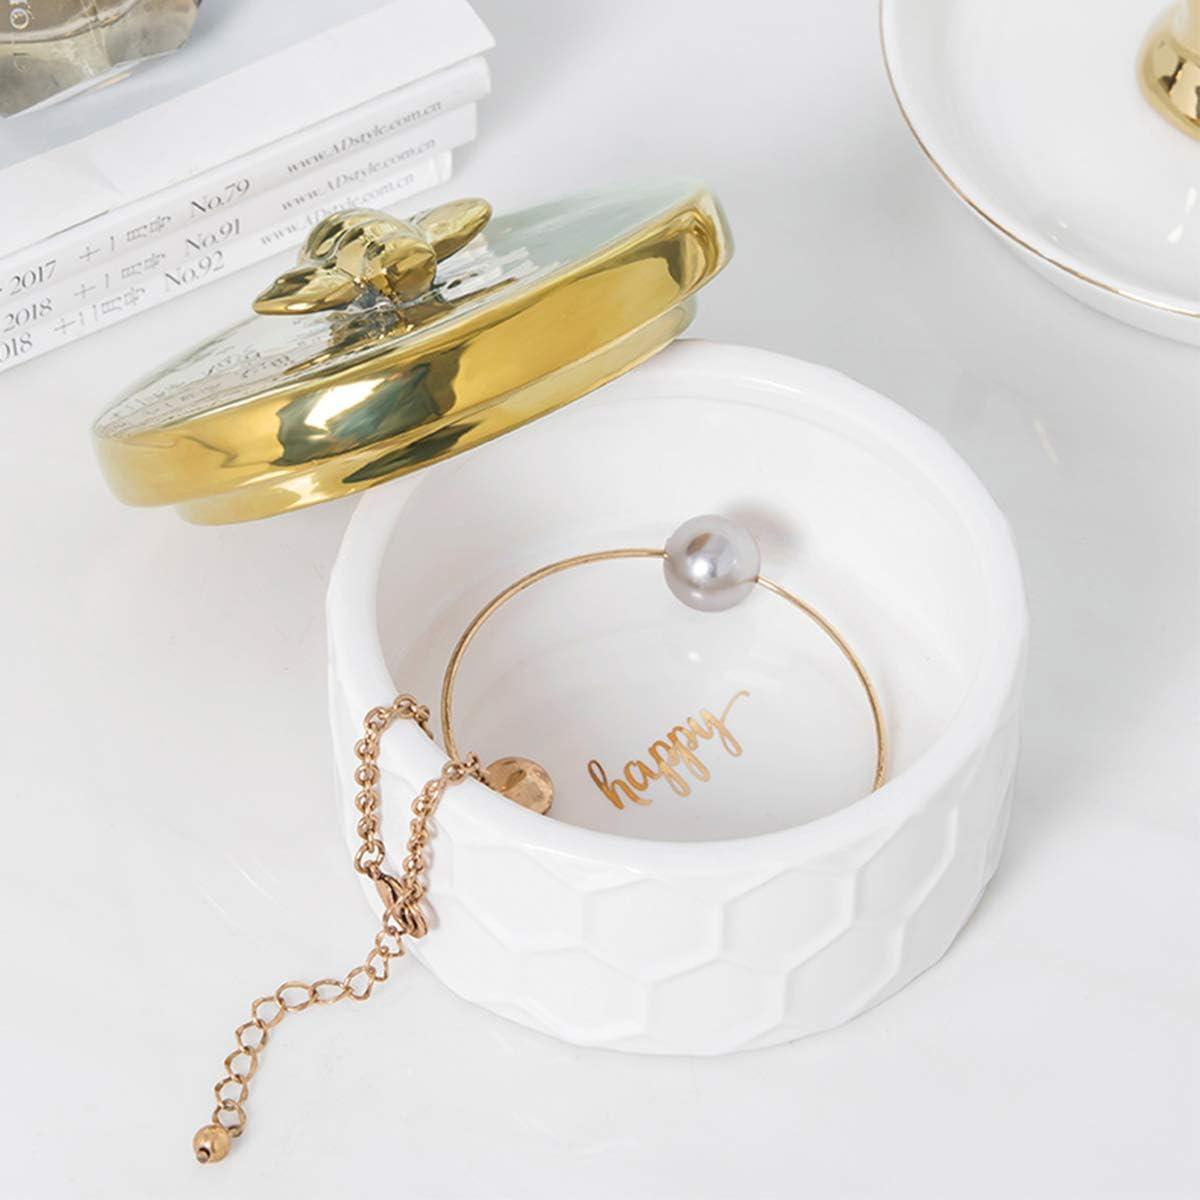 Gift for Her Flamingo Trinket Dish Rings Earrings Bracelets Tray Organizer